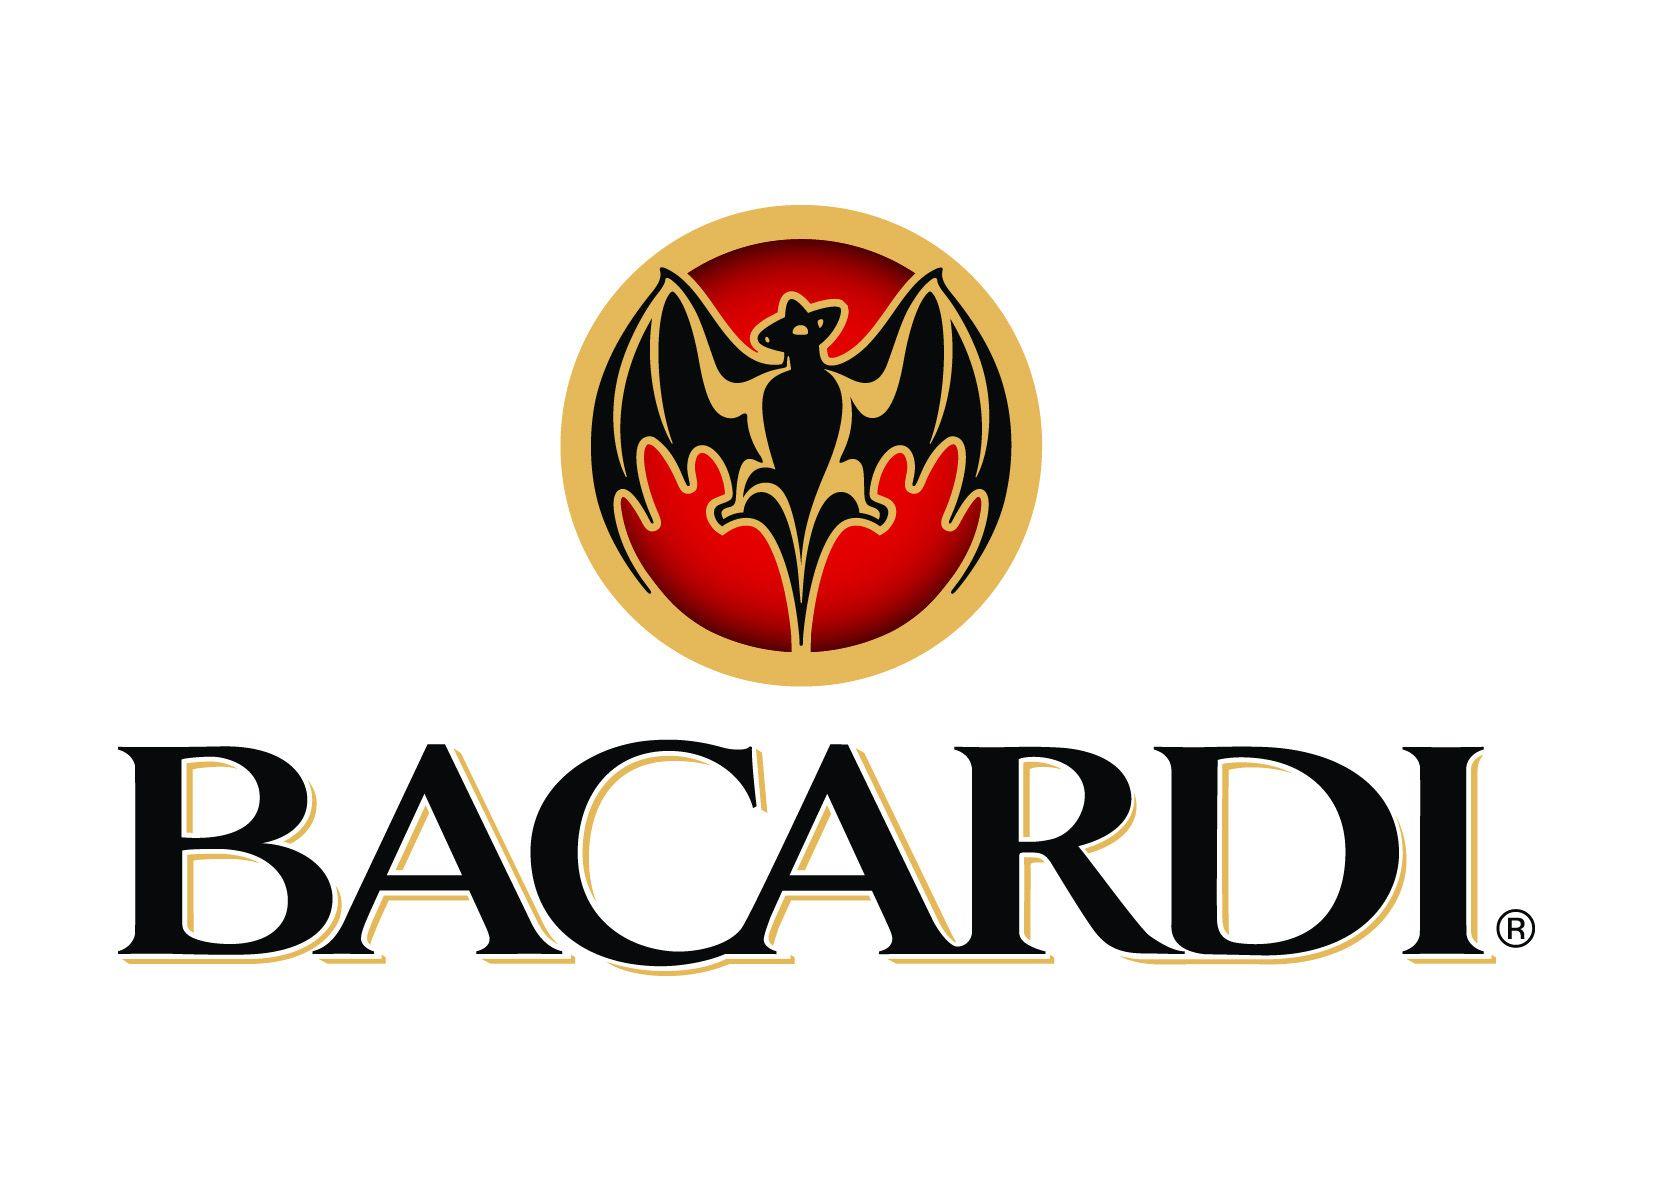 bacardi-logo1